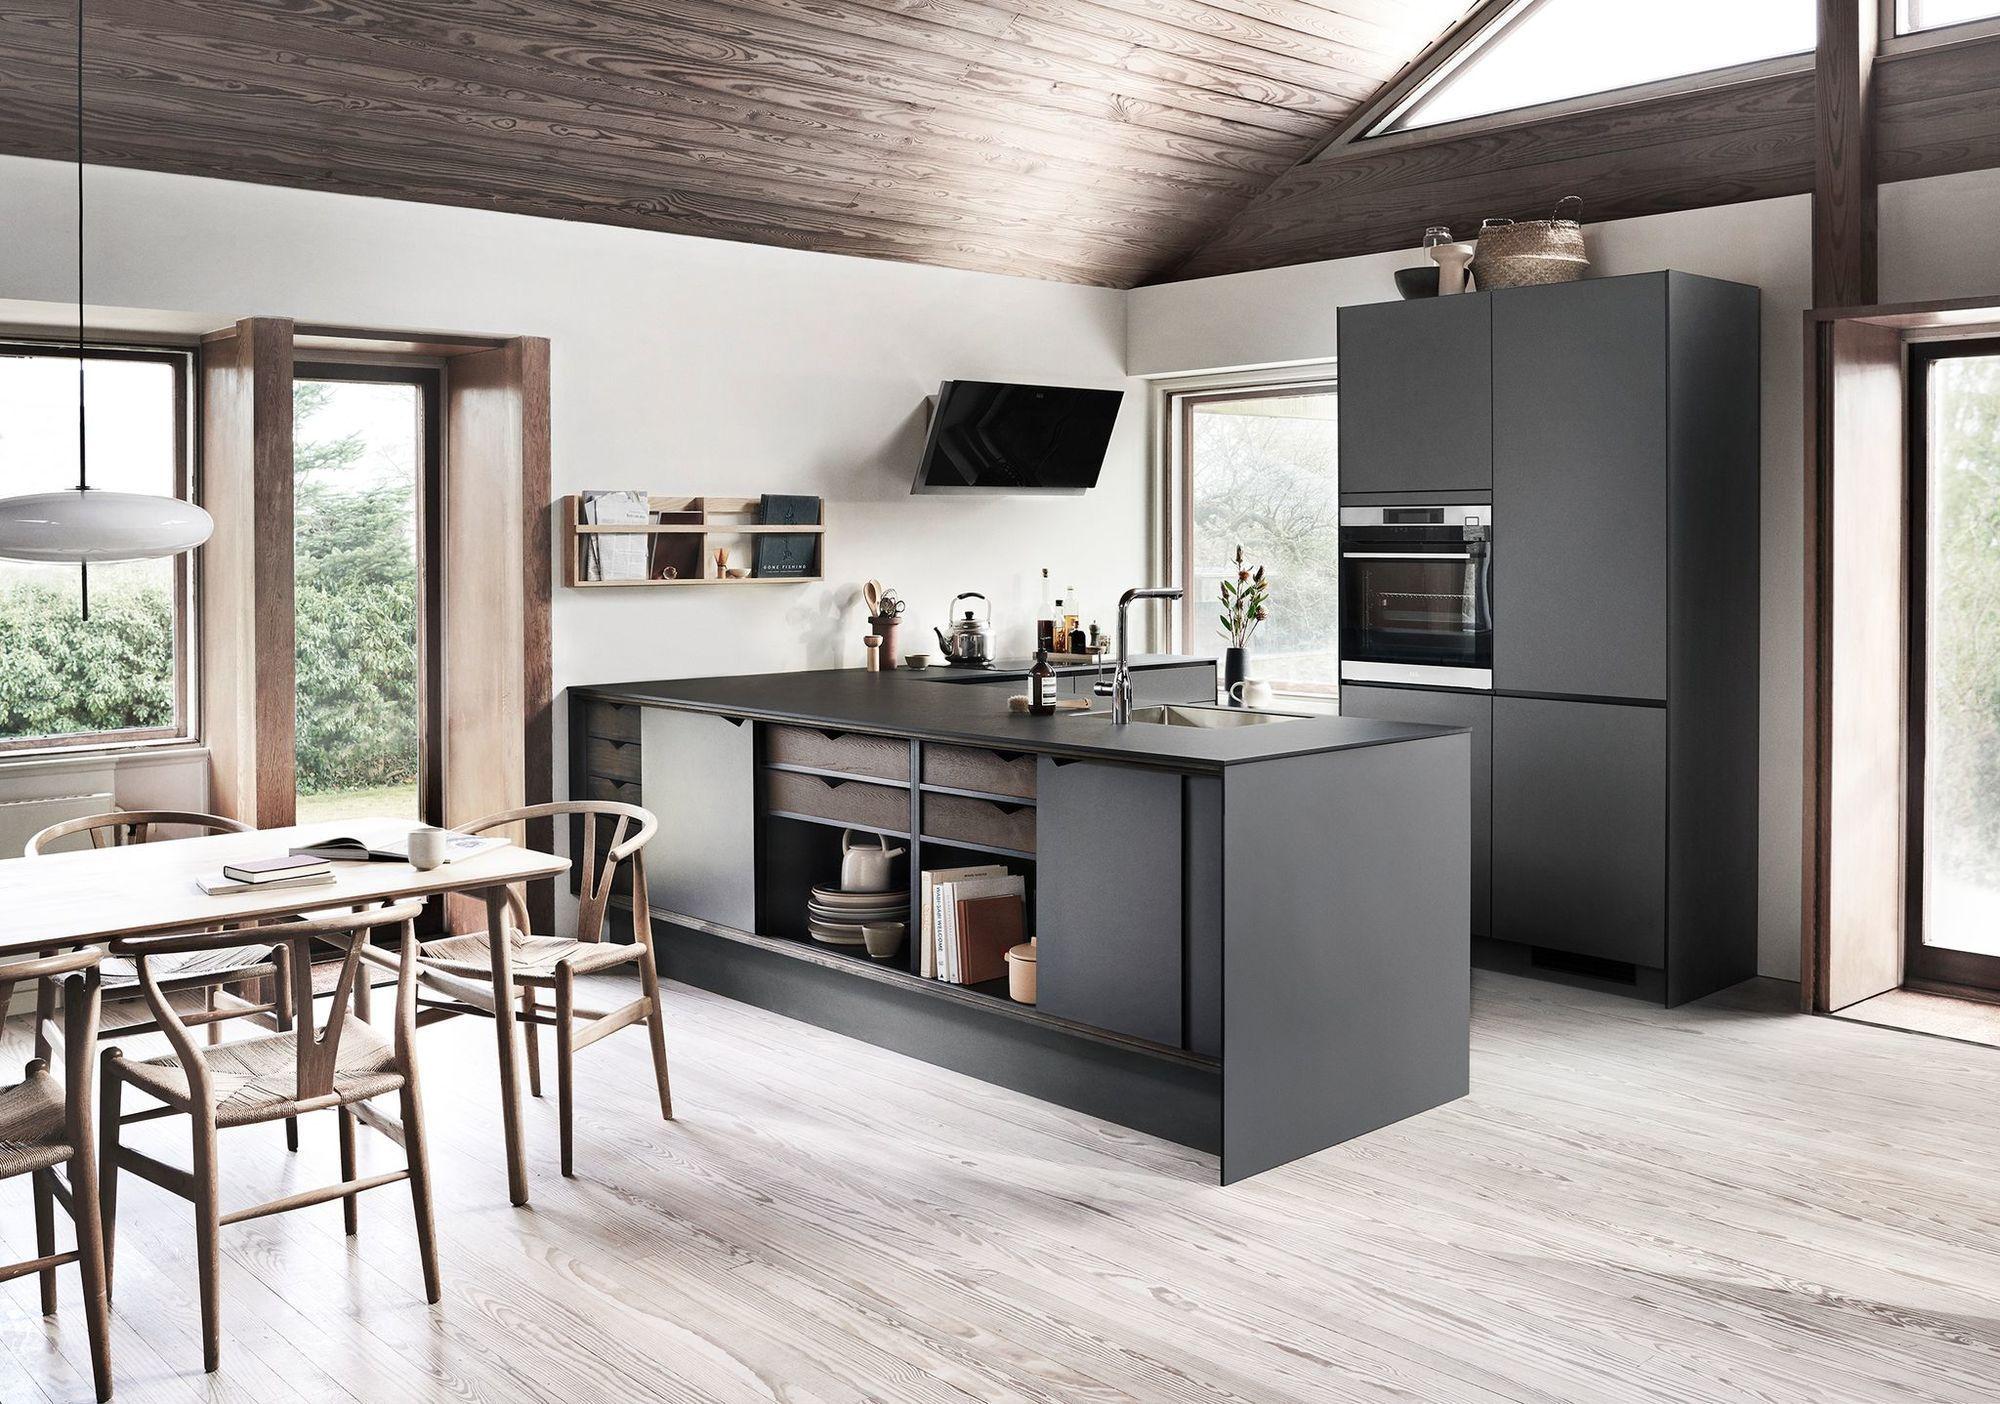 Cuisine Design Cuisine Design Ilot Cuisine Design Moderne Cuisine Design Moderne Blanche Cuisine In 2020 Kitchen Redecorating Kitchen Remodel Kitchen Inspirations